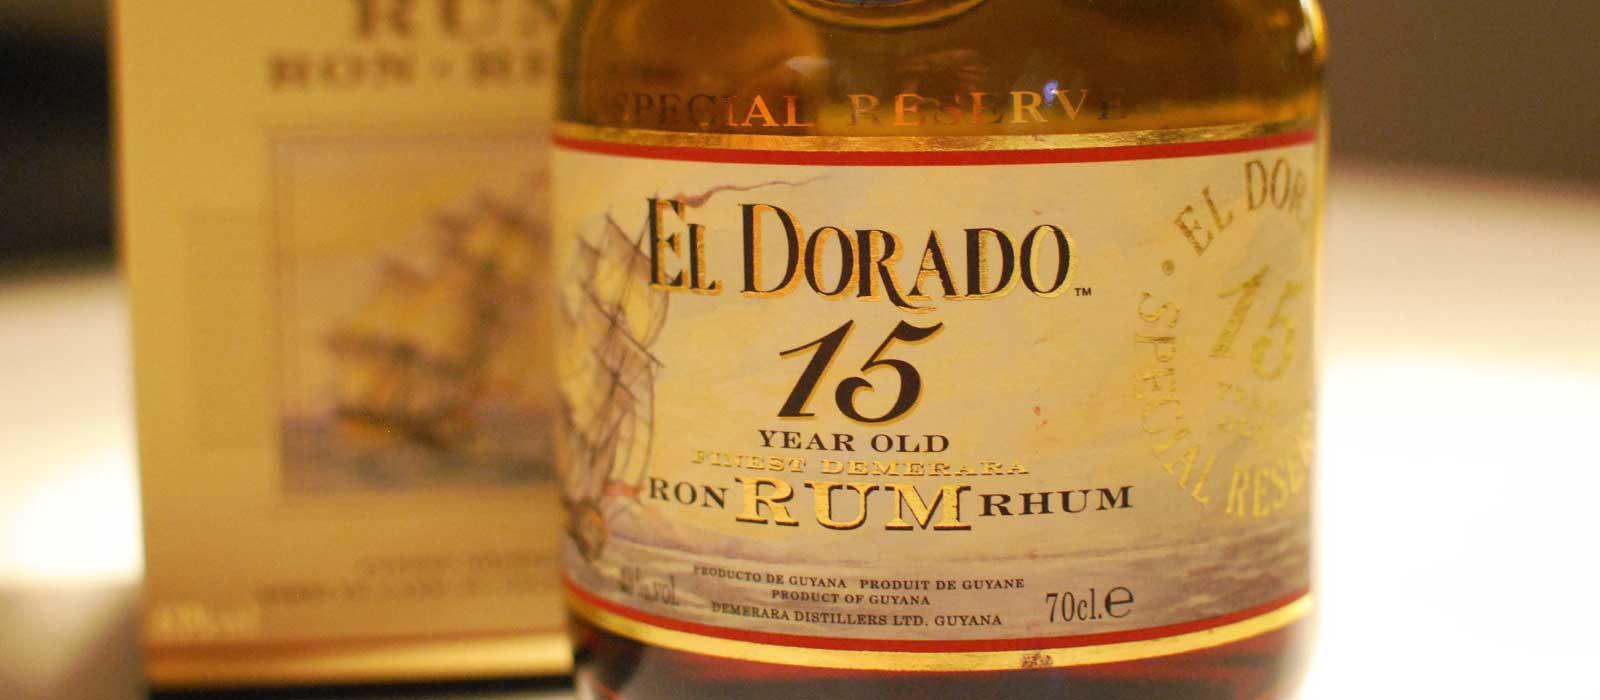 Månadens rom september 2016: El Dorado Special Reserve 15